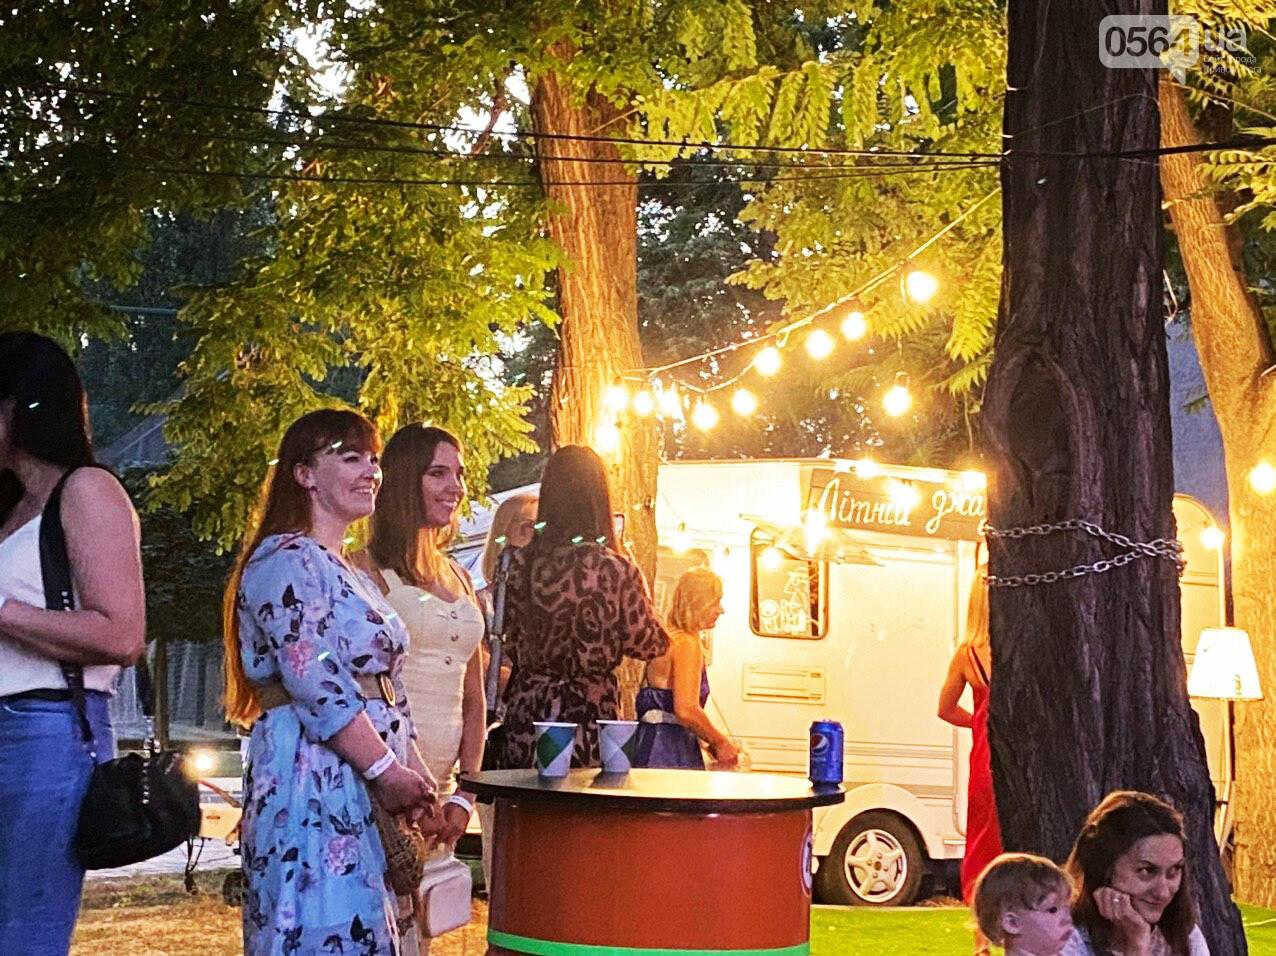 Под звездным небом криворожане наслаждались летним джазом от  Advantage Project, - ФОТО, ВИДЕО , фото-48